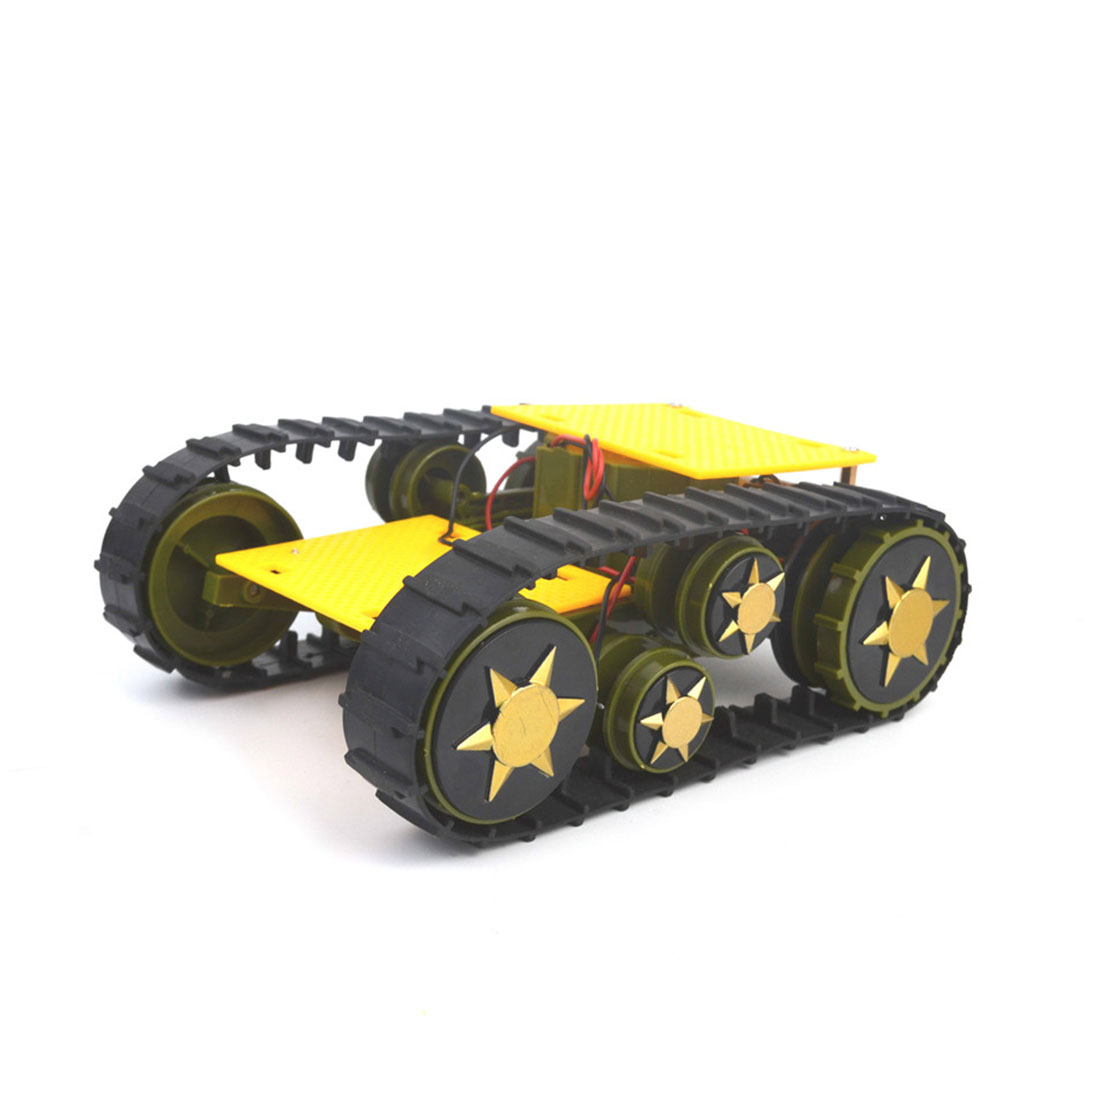 DIY Deformation Smart Tank Robot Crawler Caterpillar Vehicle Platform For Arduino SN1900 Kids Birthdaty Gifts